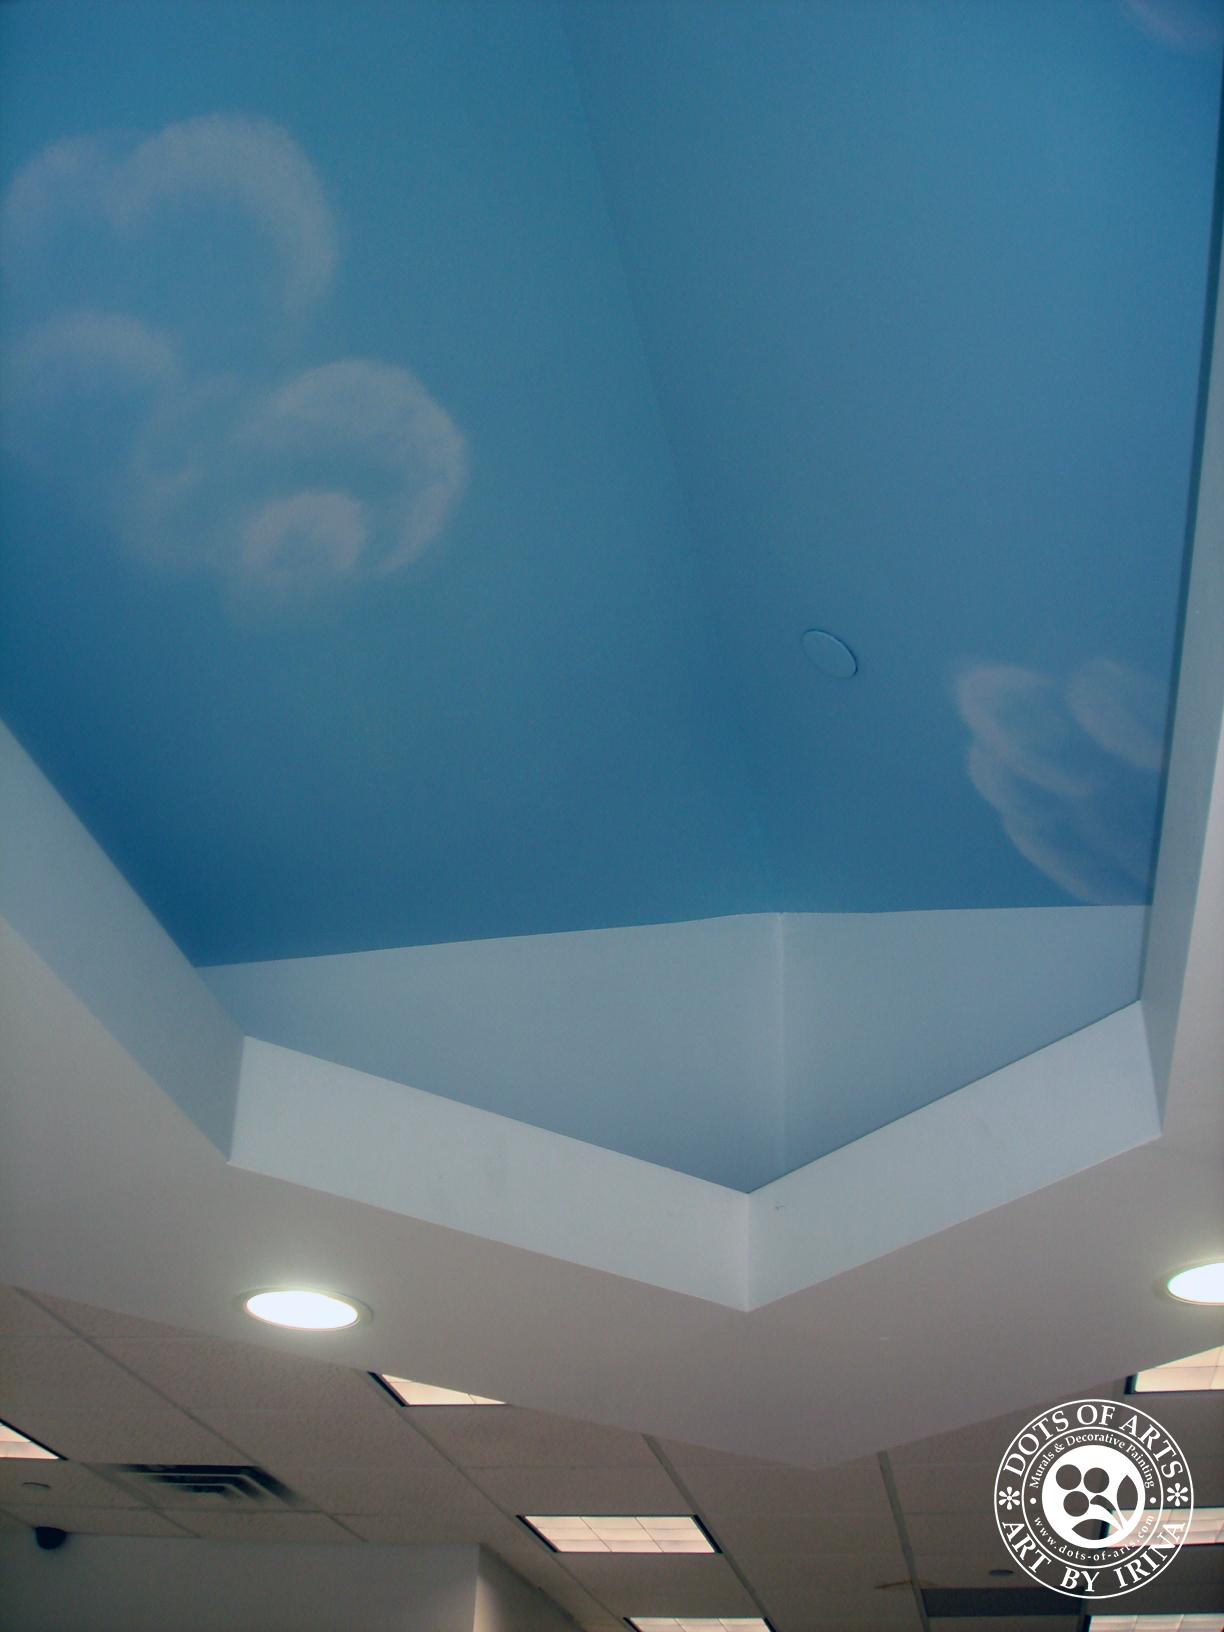 mural-custom-wall-commercial-kidz-kuts-woodbridge-nj-dots-of-arts-front-entarence-sky-clouds.jpg